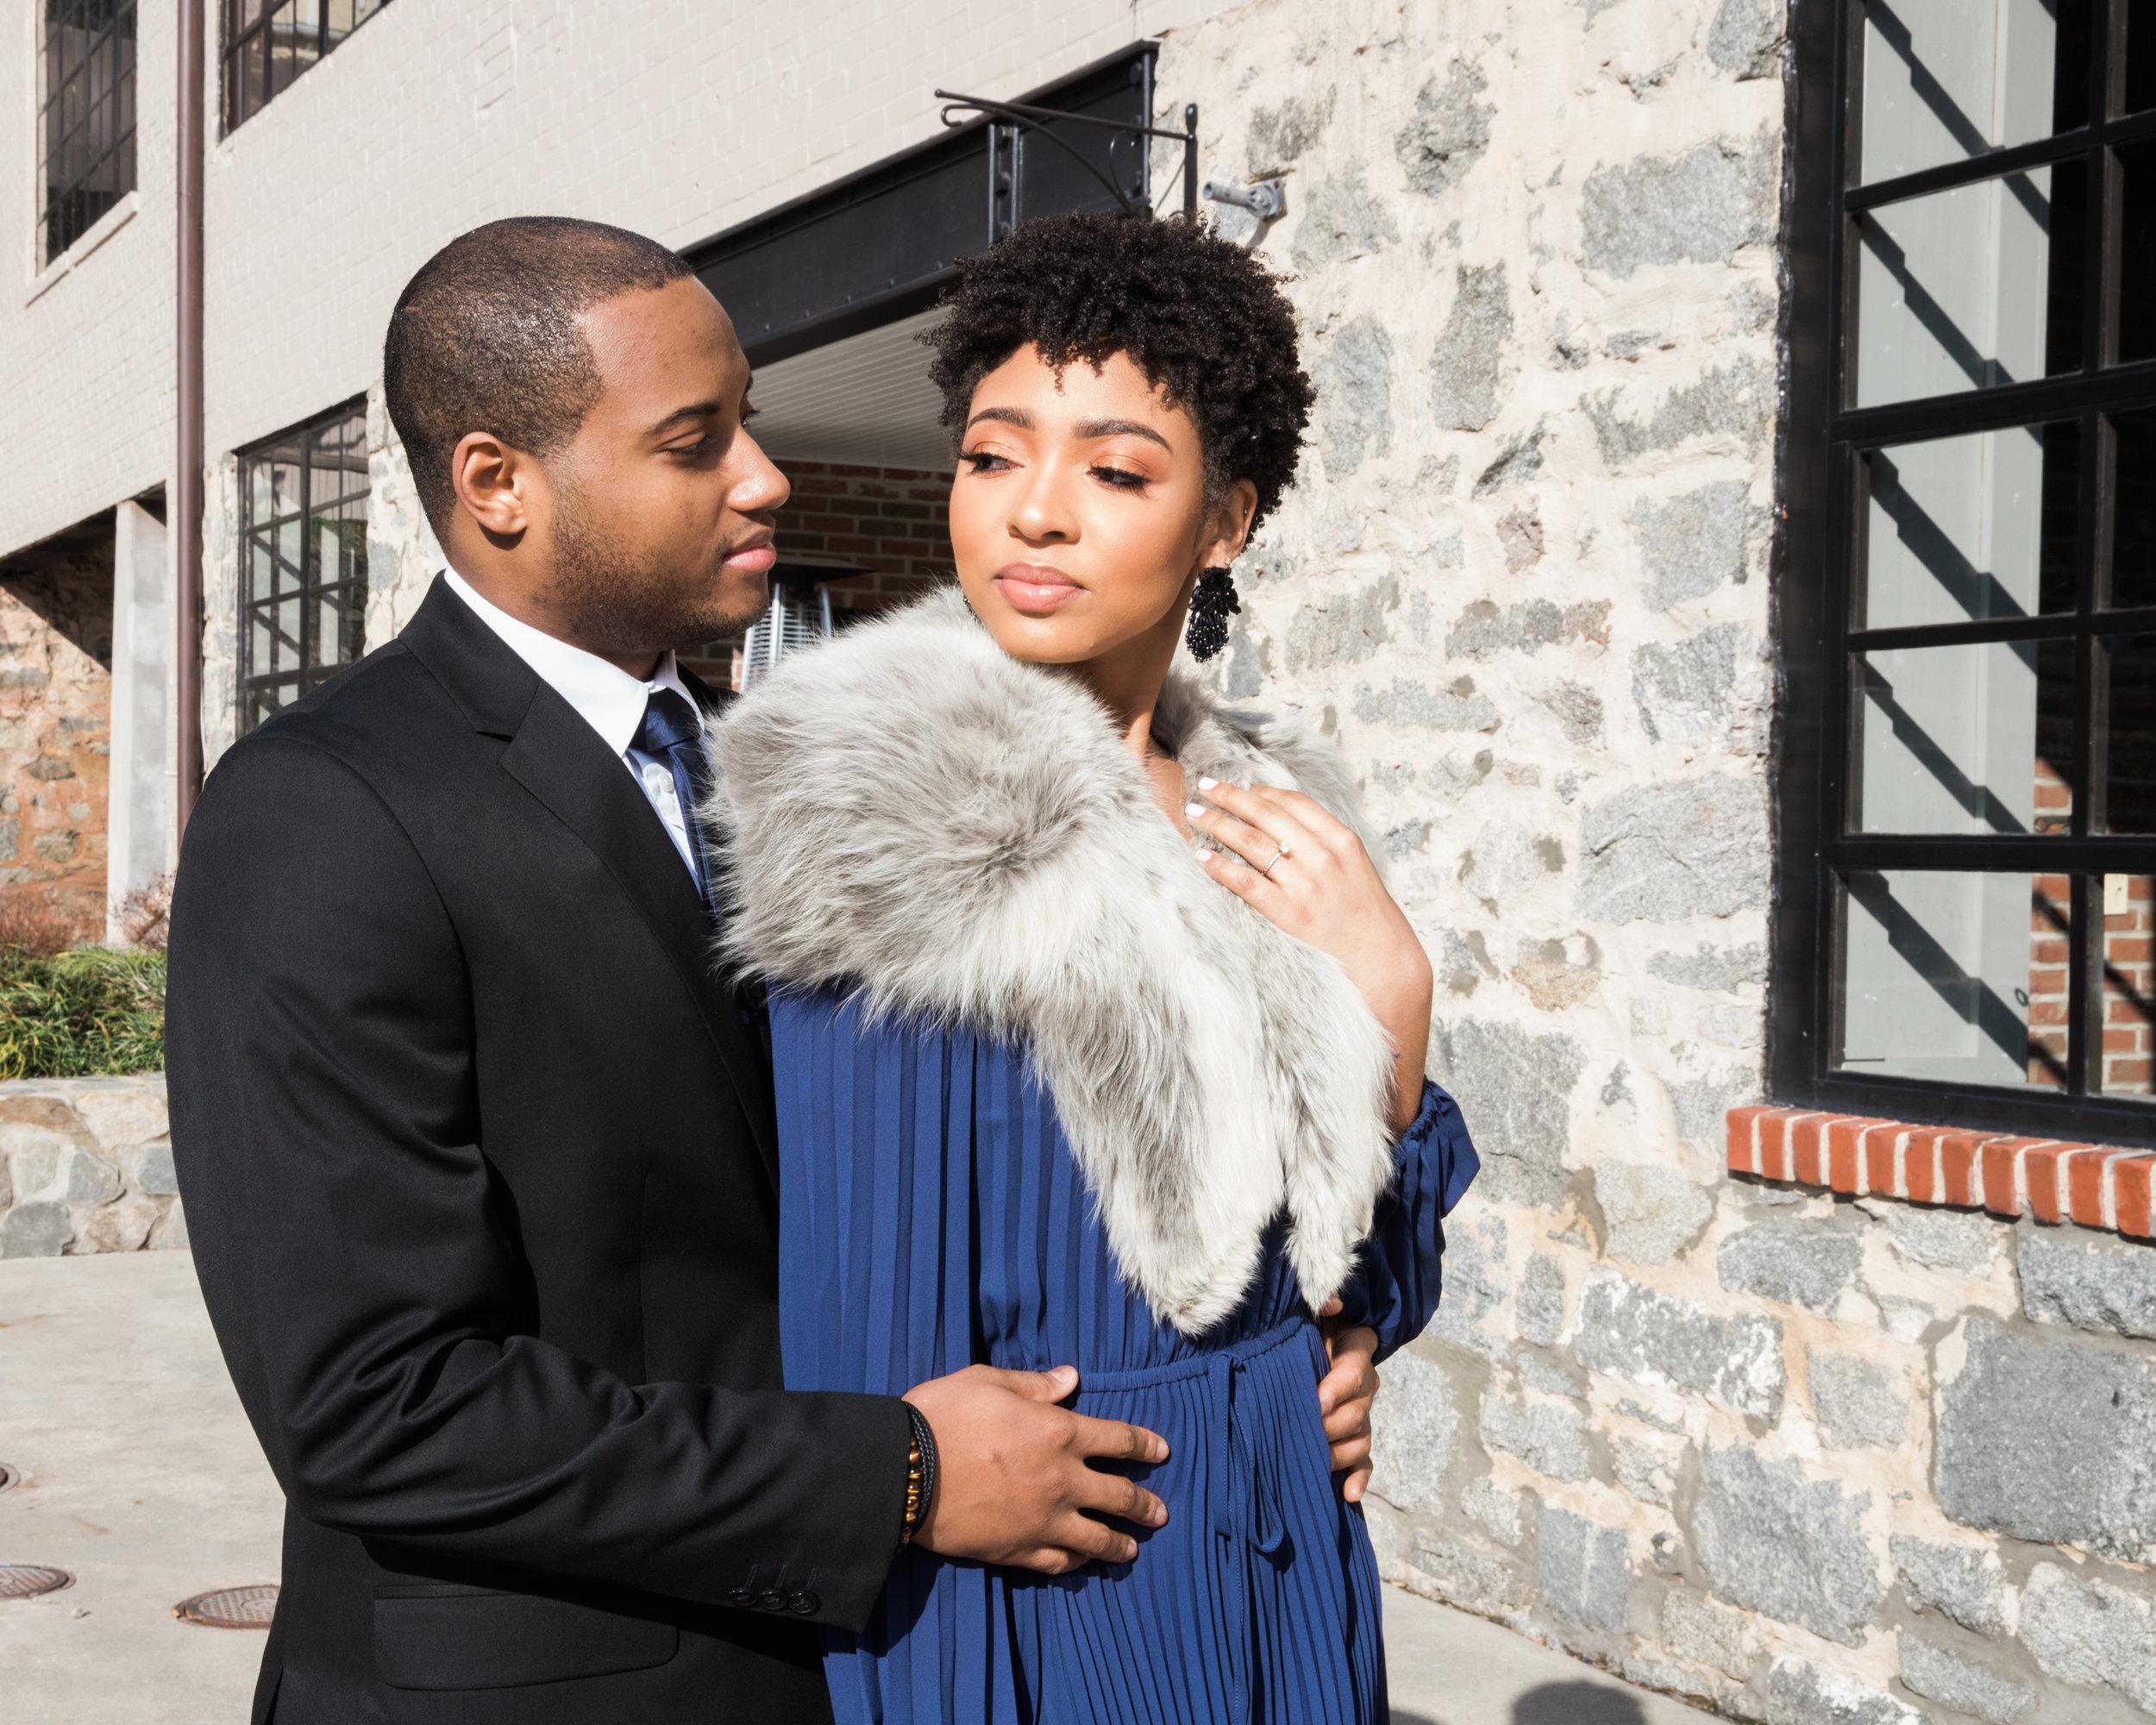 Natural Hair Black Bride in Baltimore Main Street Ballroom Engagement Session by Megapixels Media Photography-25.jpg